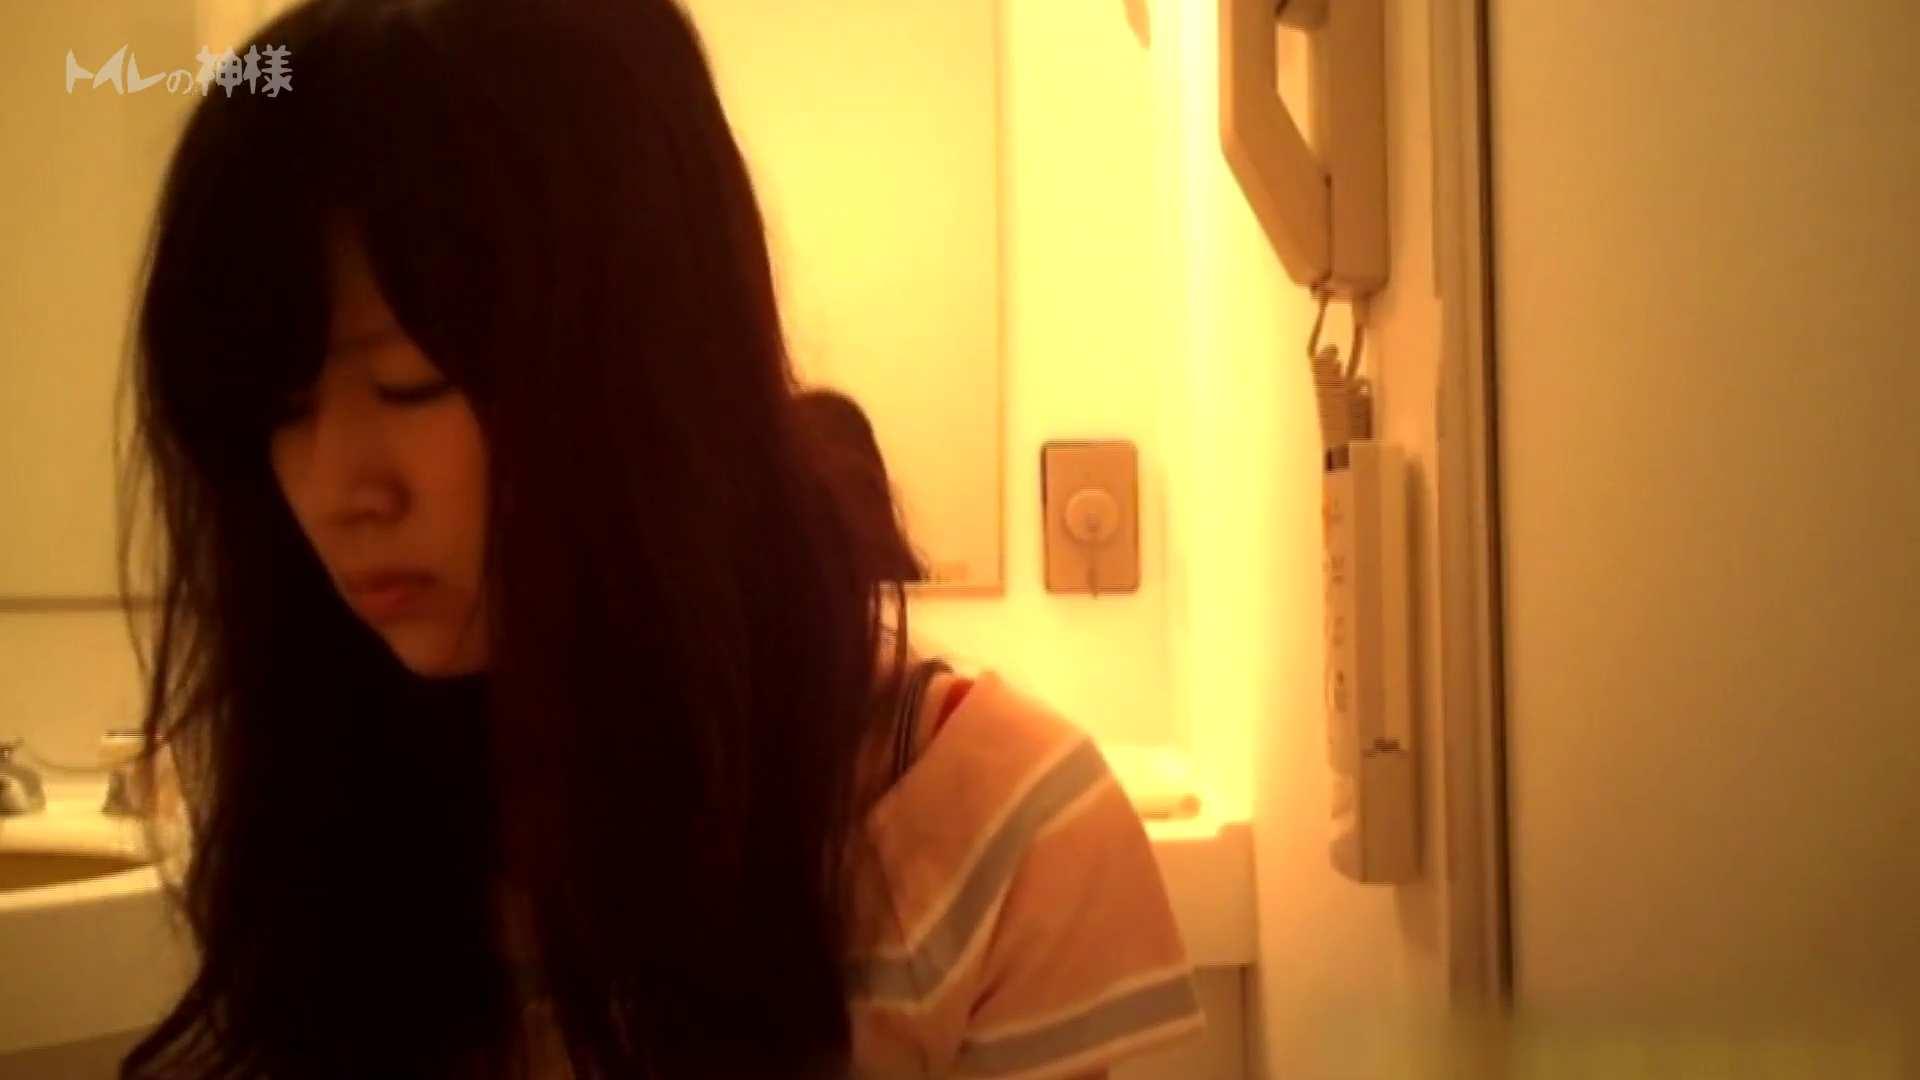 Vol.04 女子大生のトイレ恥態 OLハメ撮り  104Pix 59